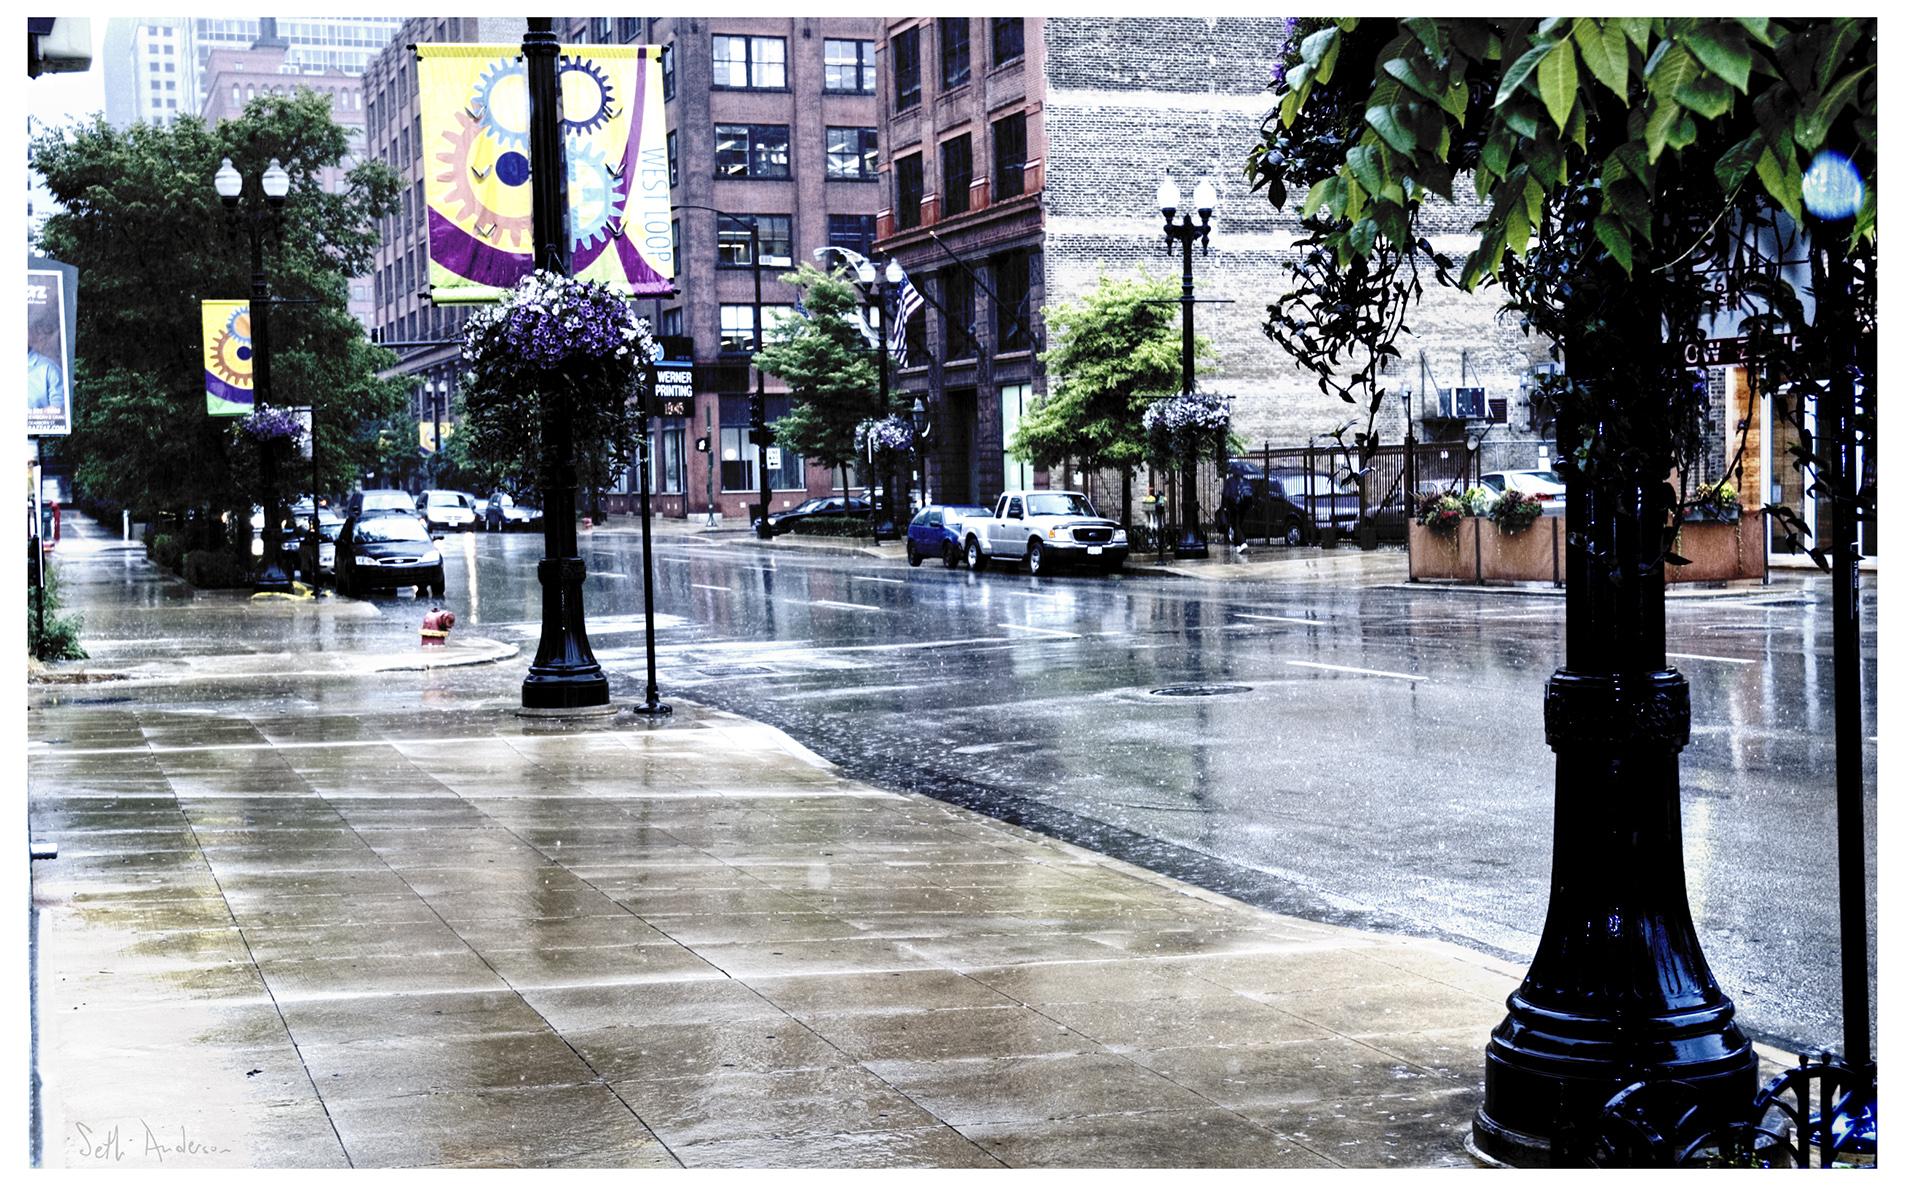 Rain Comes for the Archbishop's Cat-2013